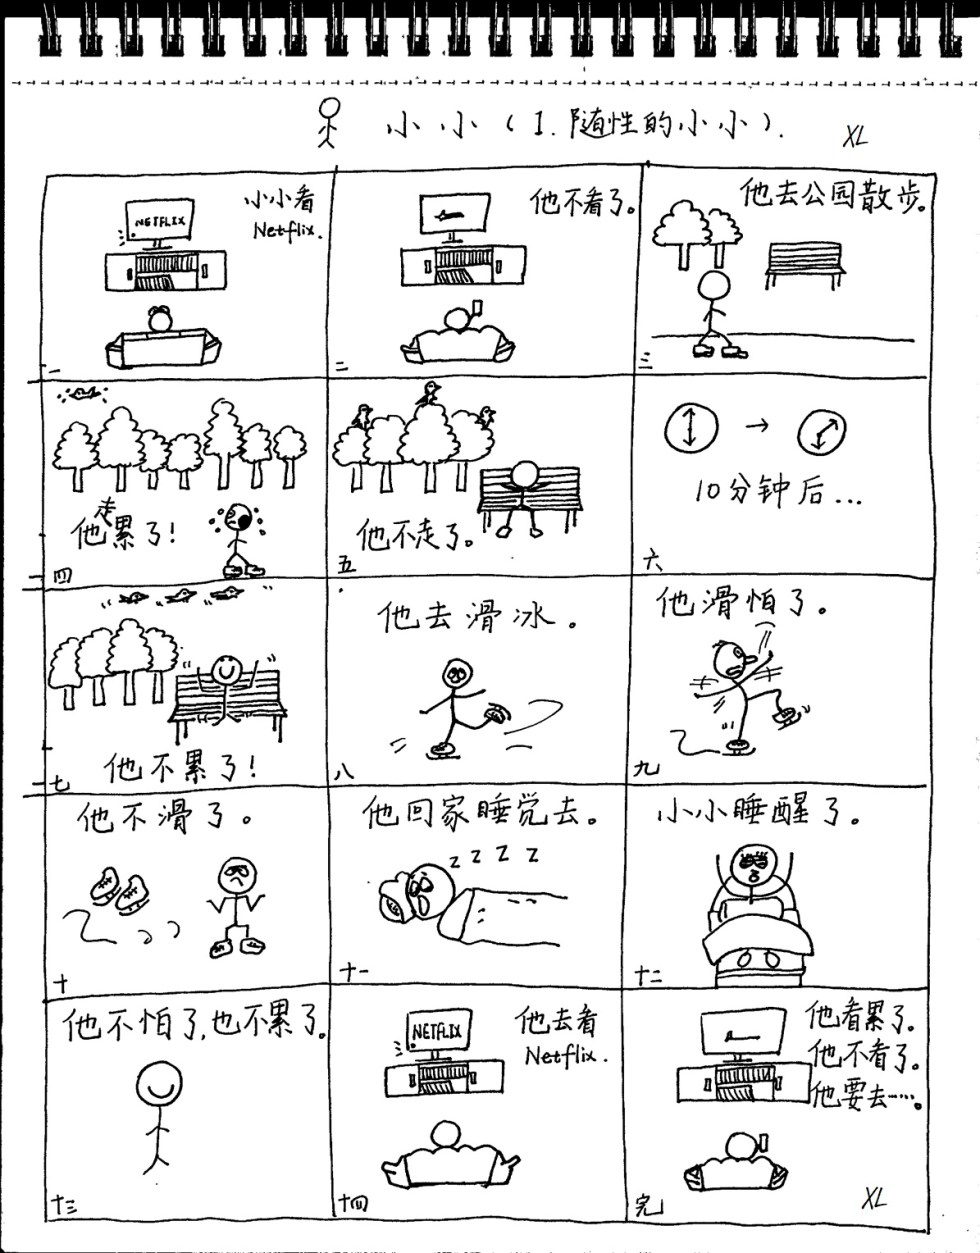 xian_lu_comic_strip_for_cfl_samples8